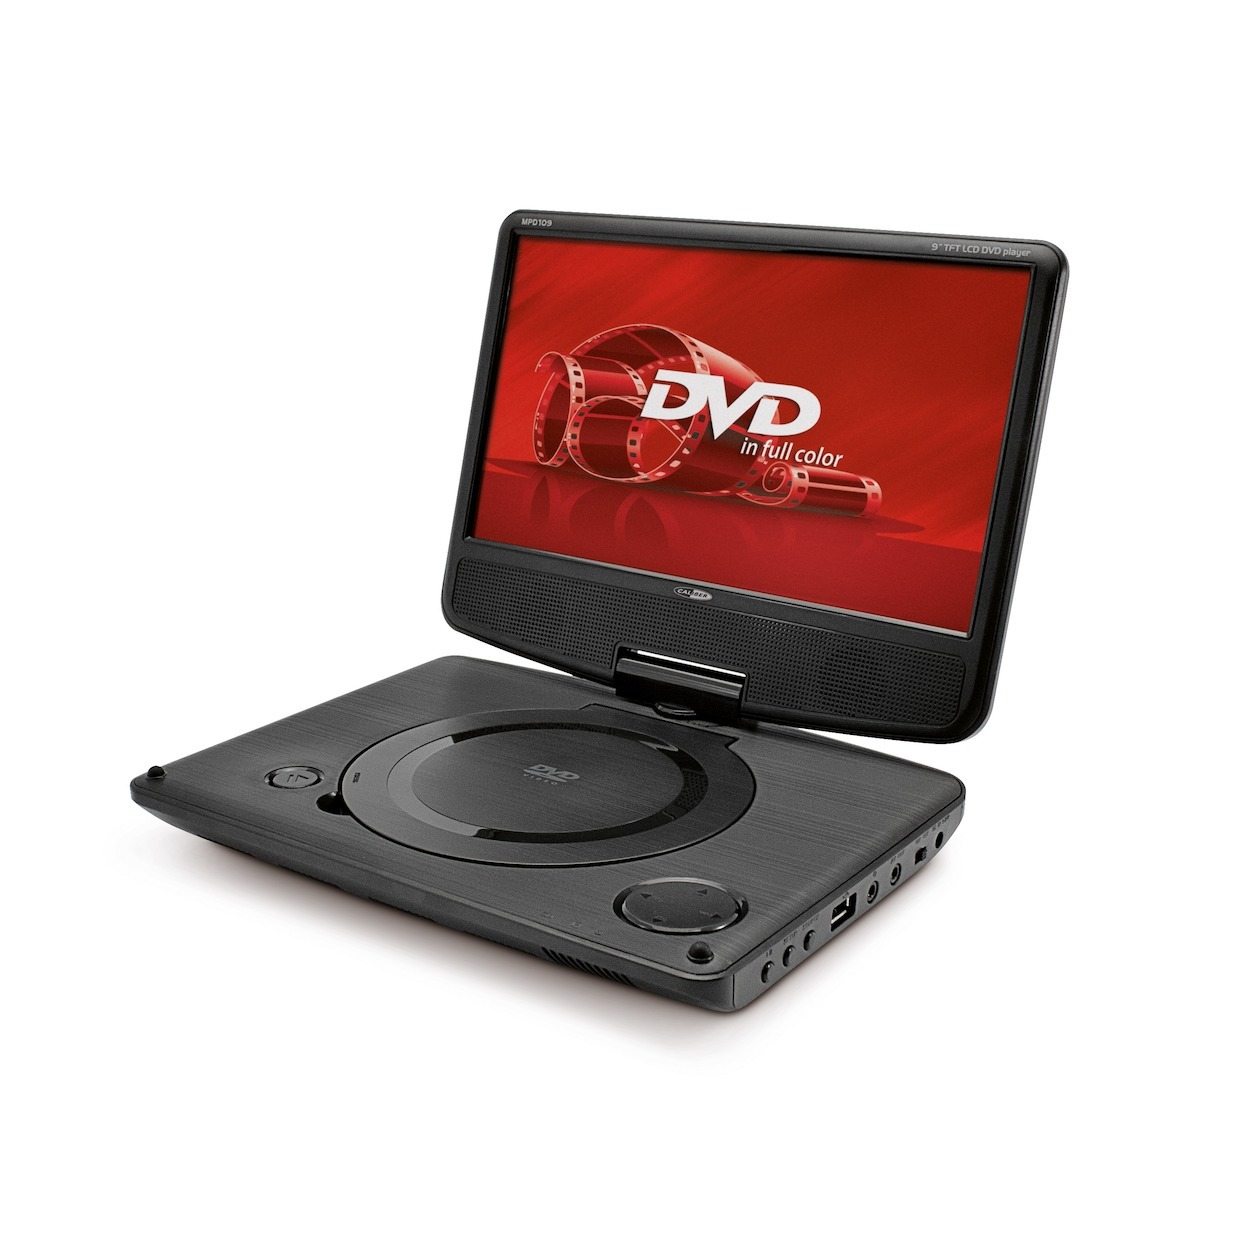 Caliber portable dvd speler MPD112